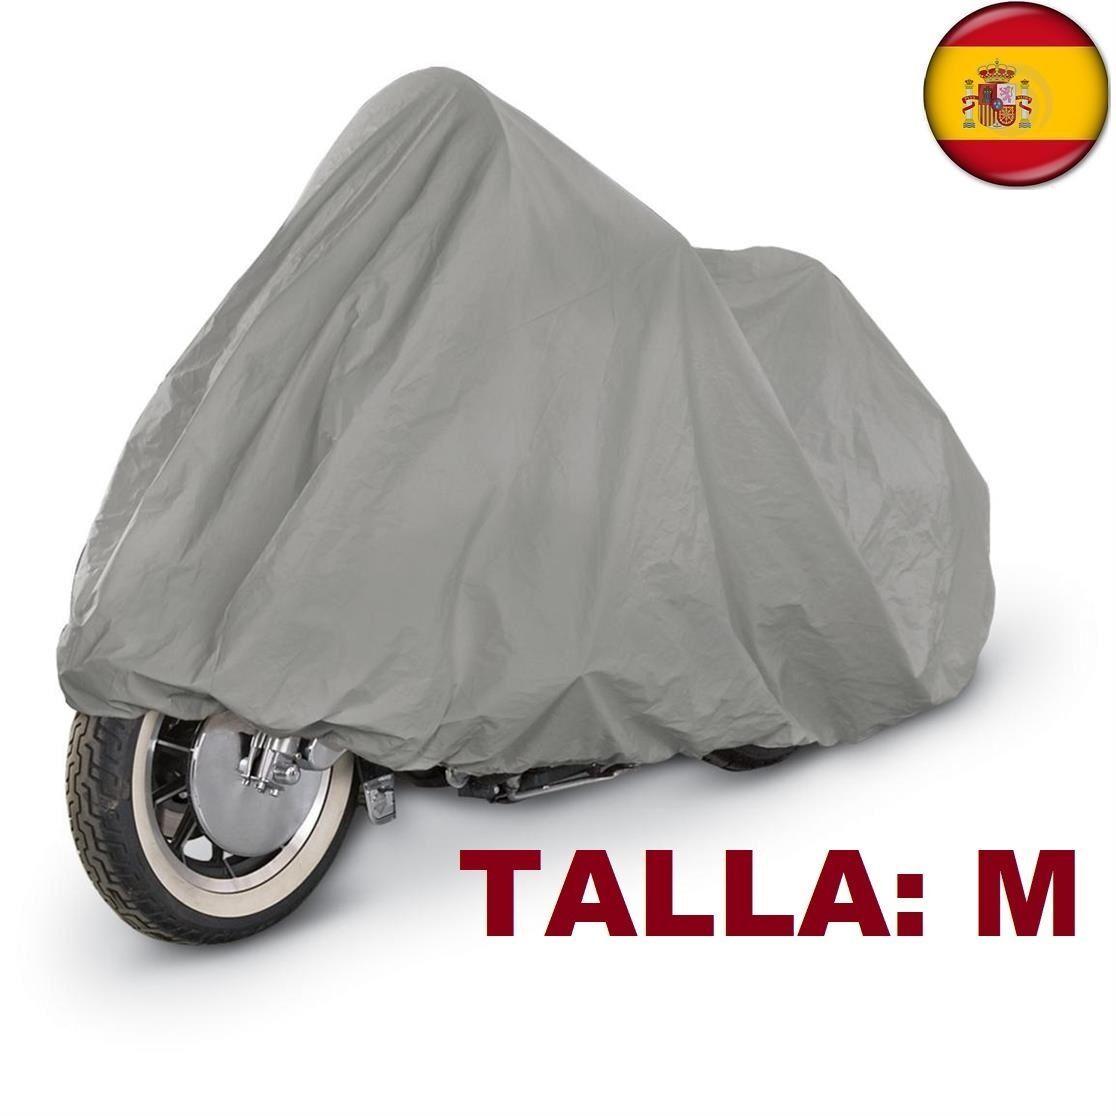 Funda cubierta impermeable para Moto scooter TALLA: M 210 x120cm